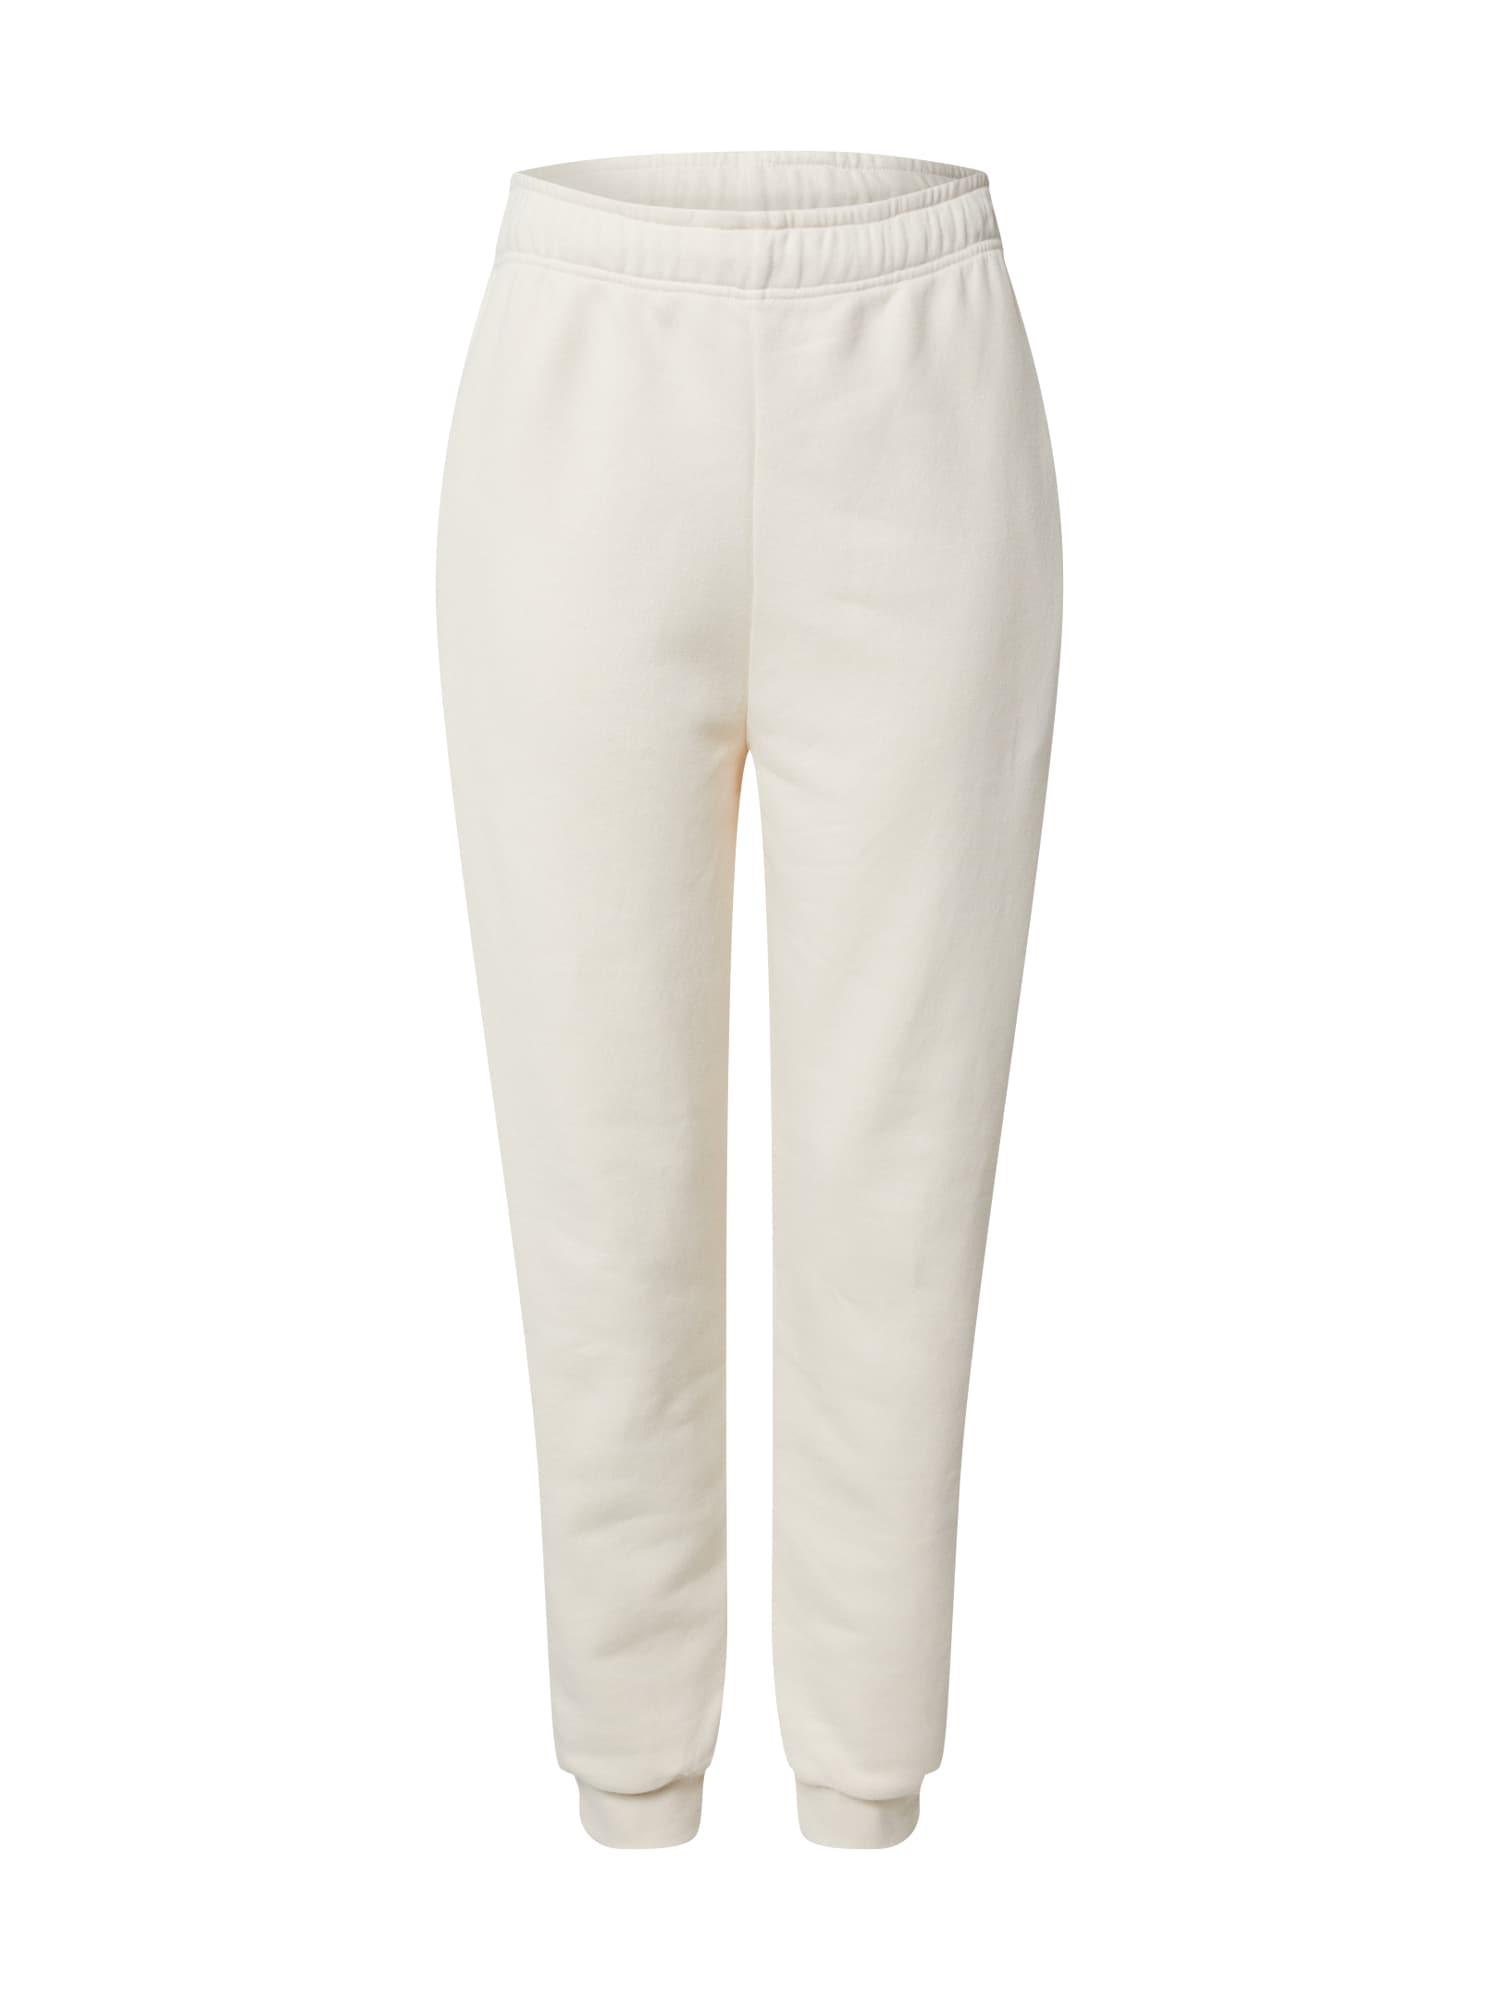 EDITED Kelnės 'Riley' margai balta